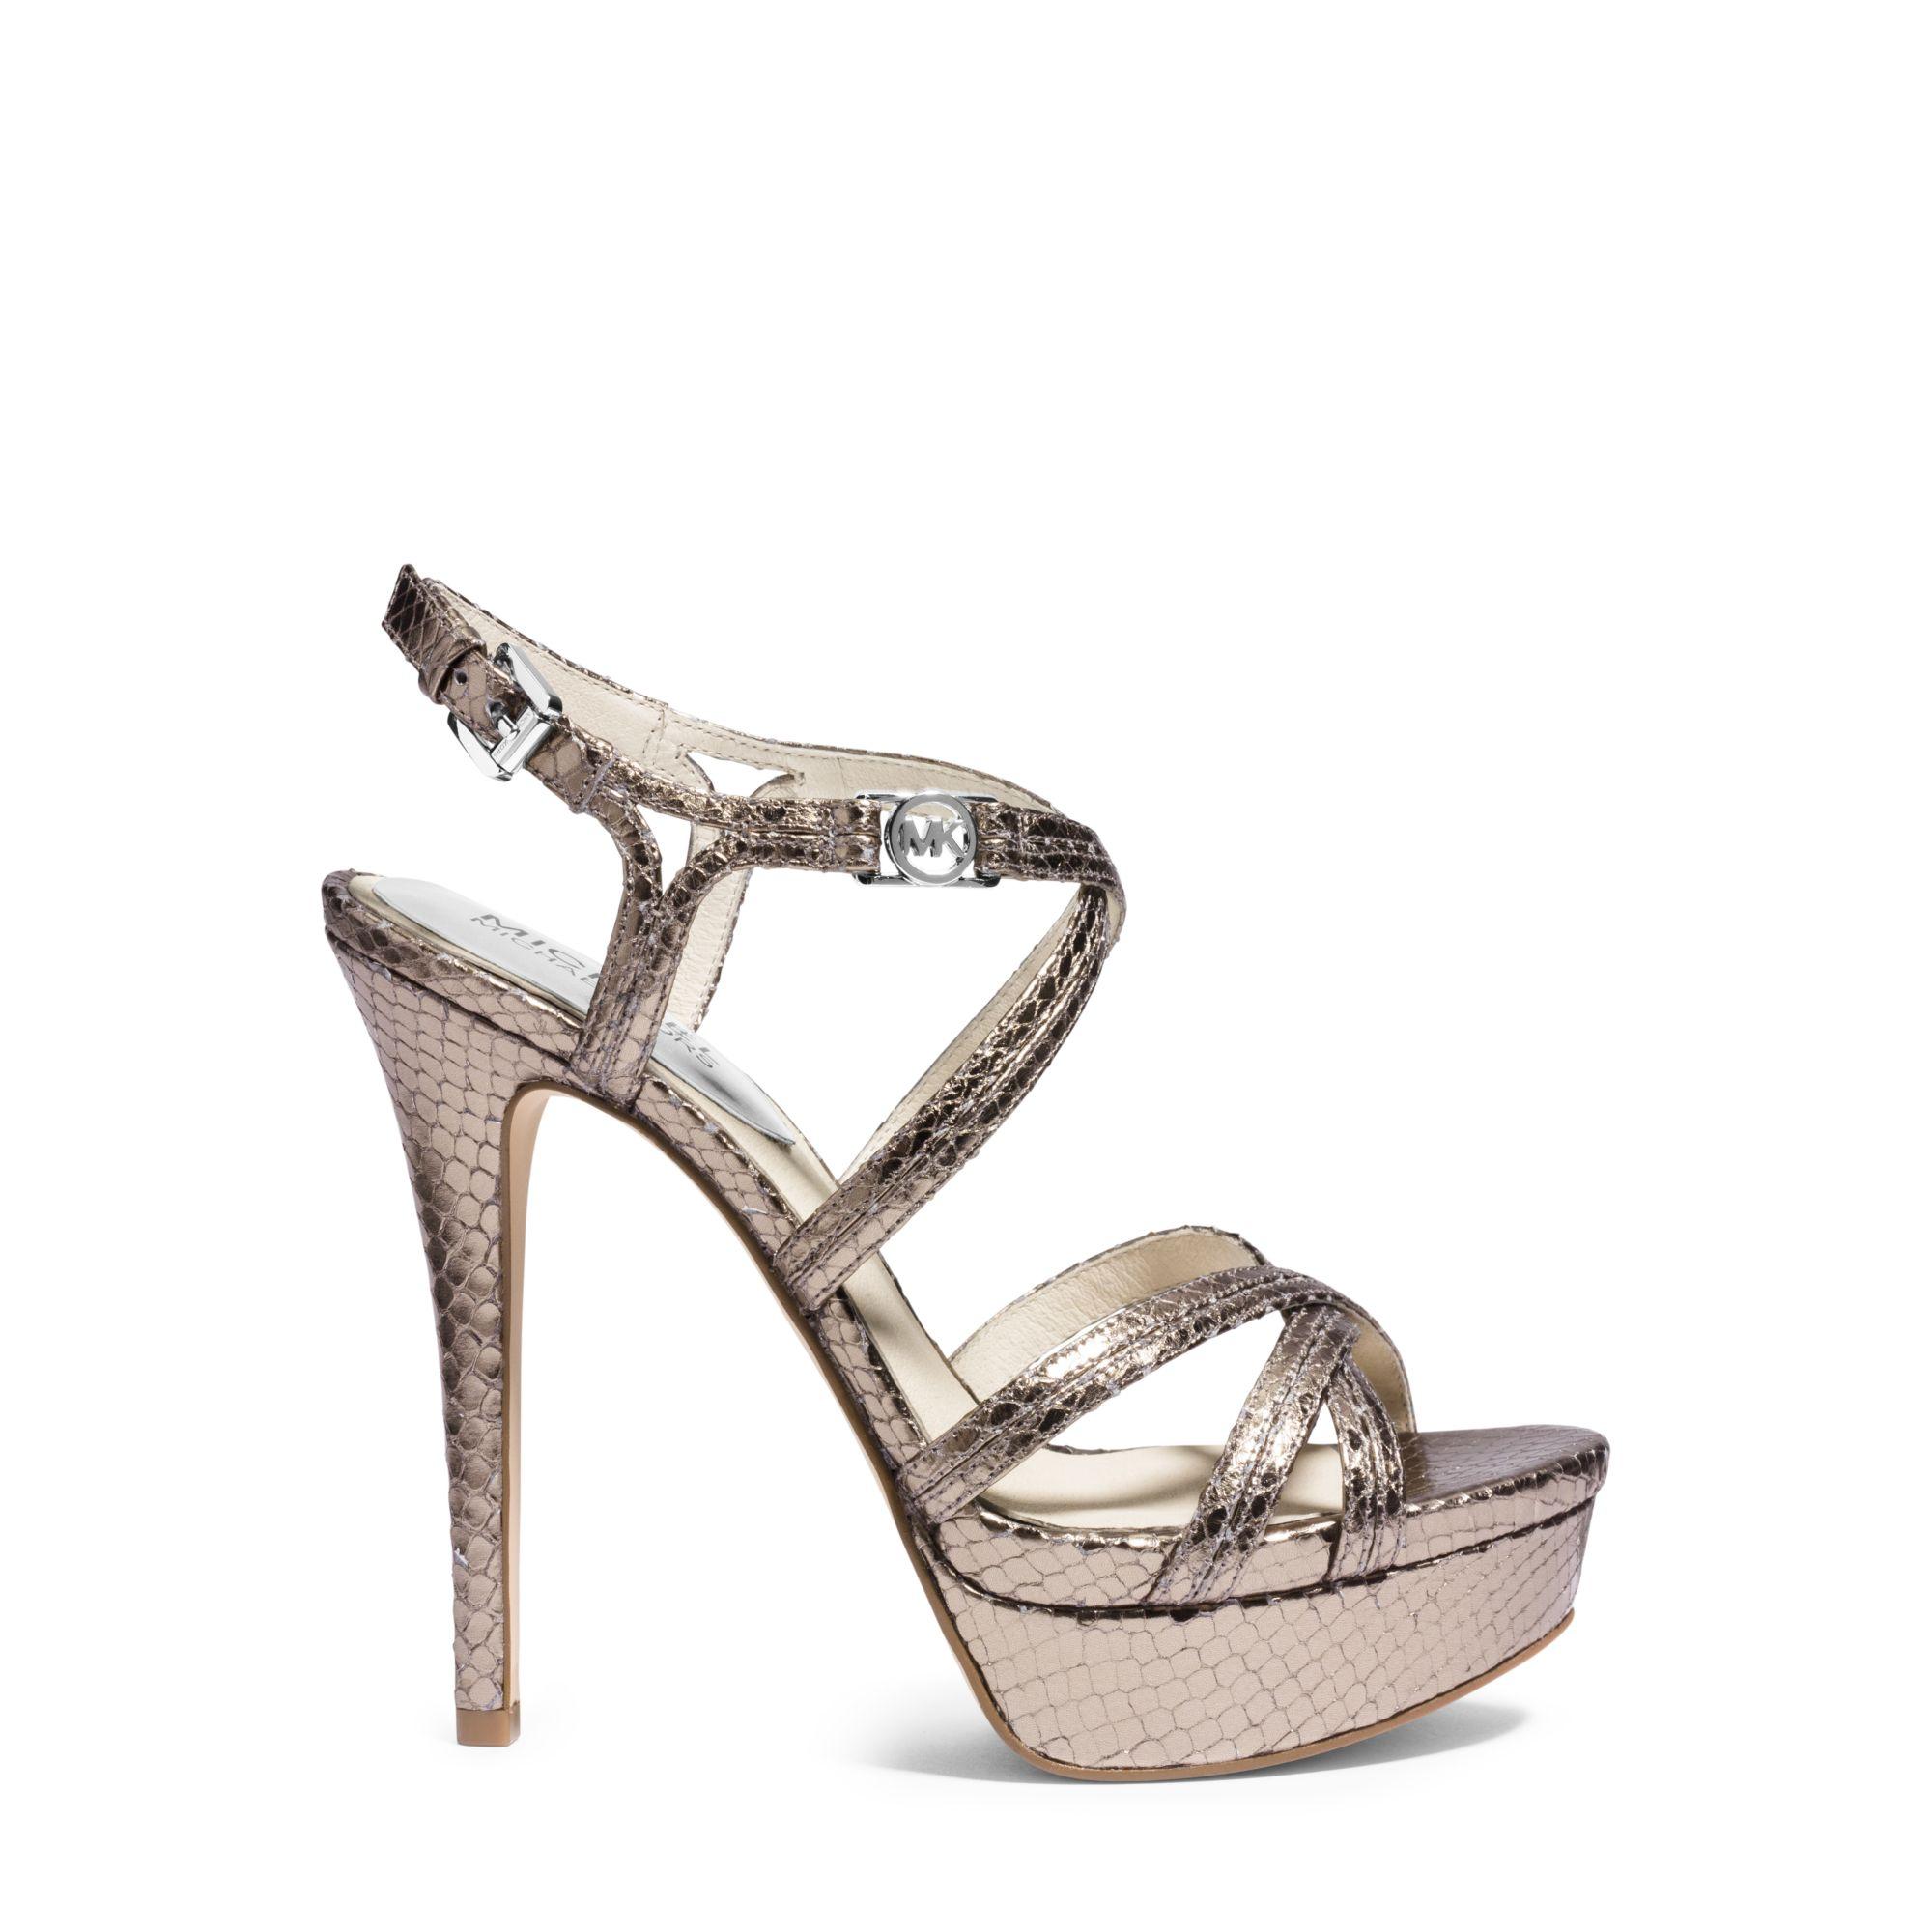 83407ff214008 Lyst - Michael Kors Cicely Metallic Embossed-leather Platform Sandal ...